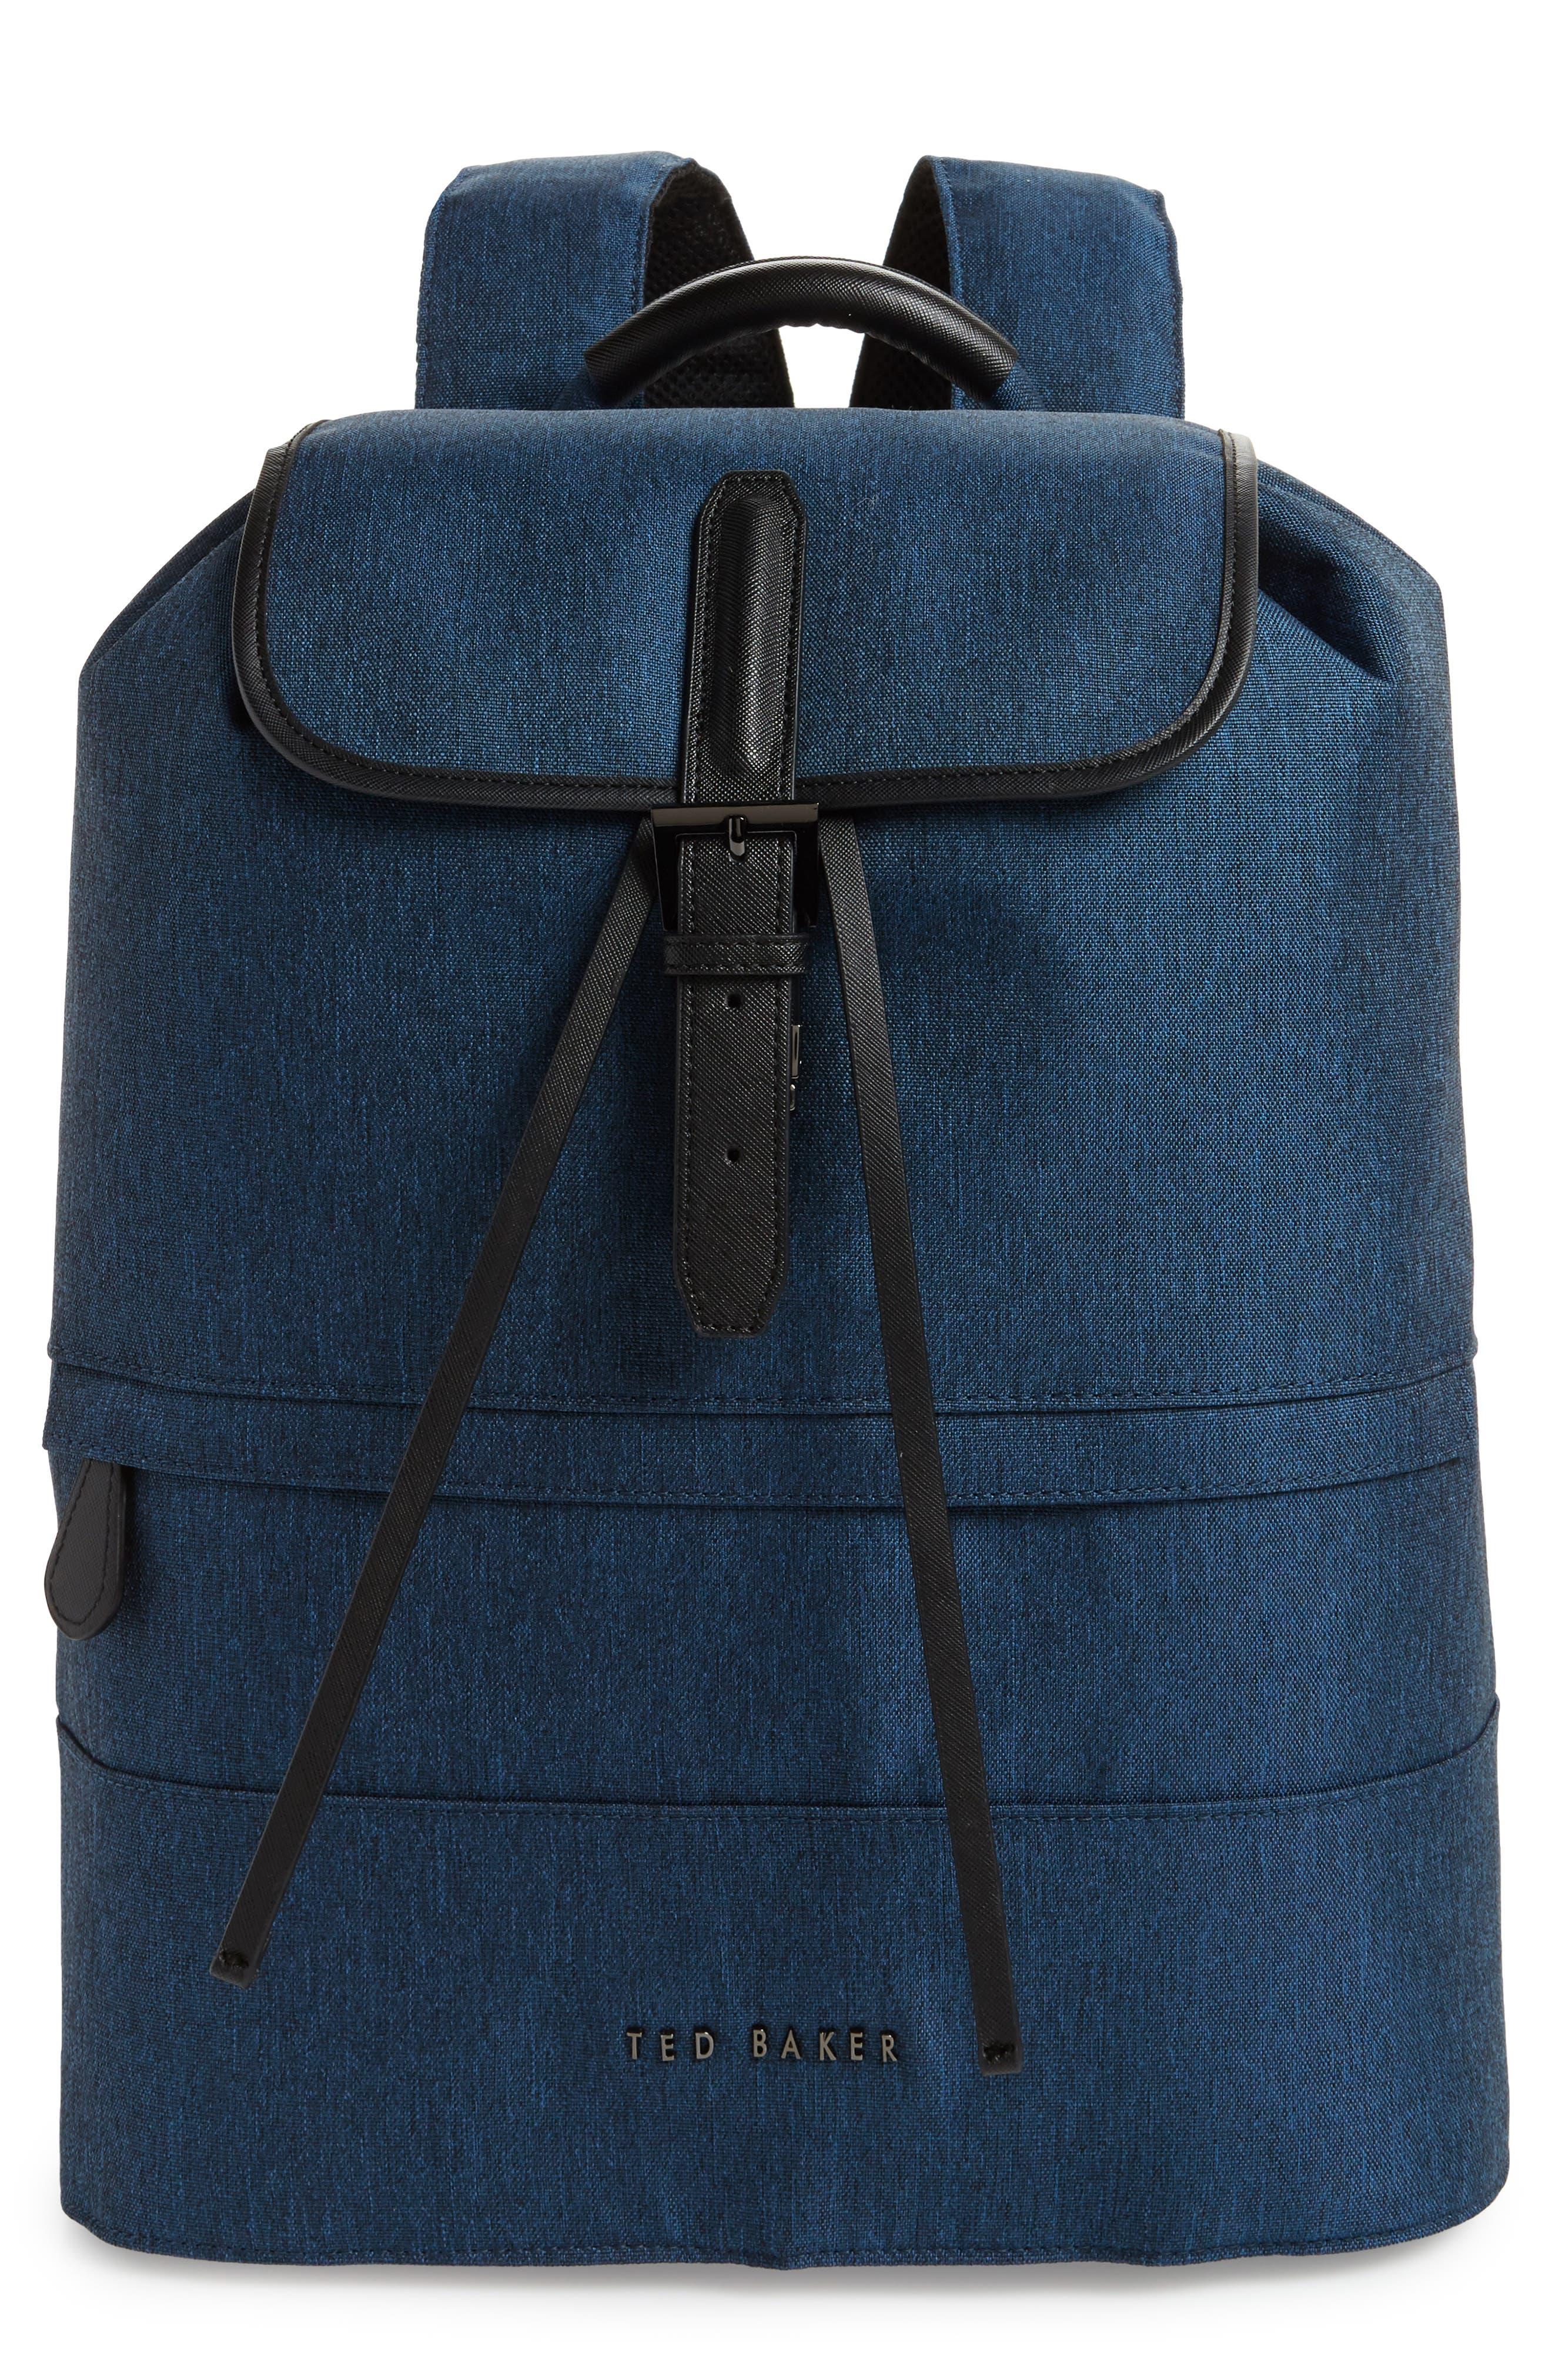 Ted Baker London Rayman Backpack